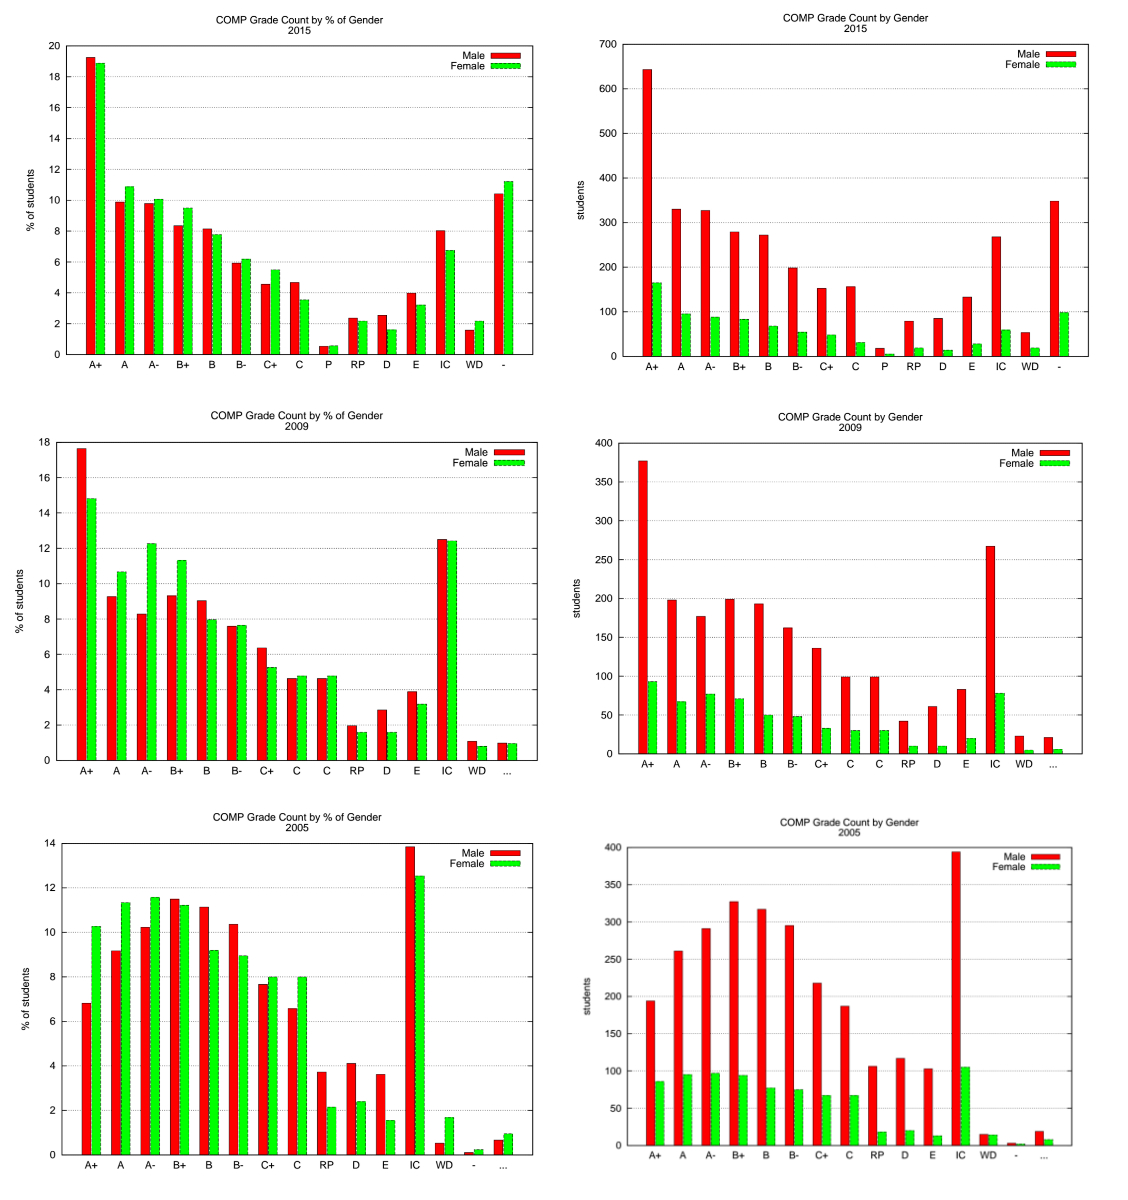 Grade distribution for 2015, 2009, 2005